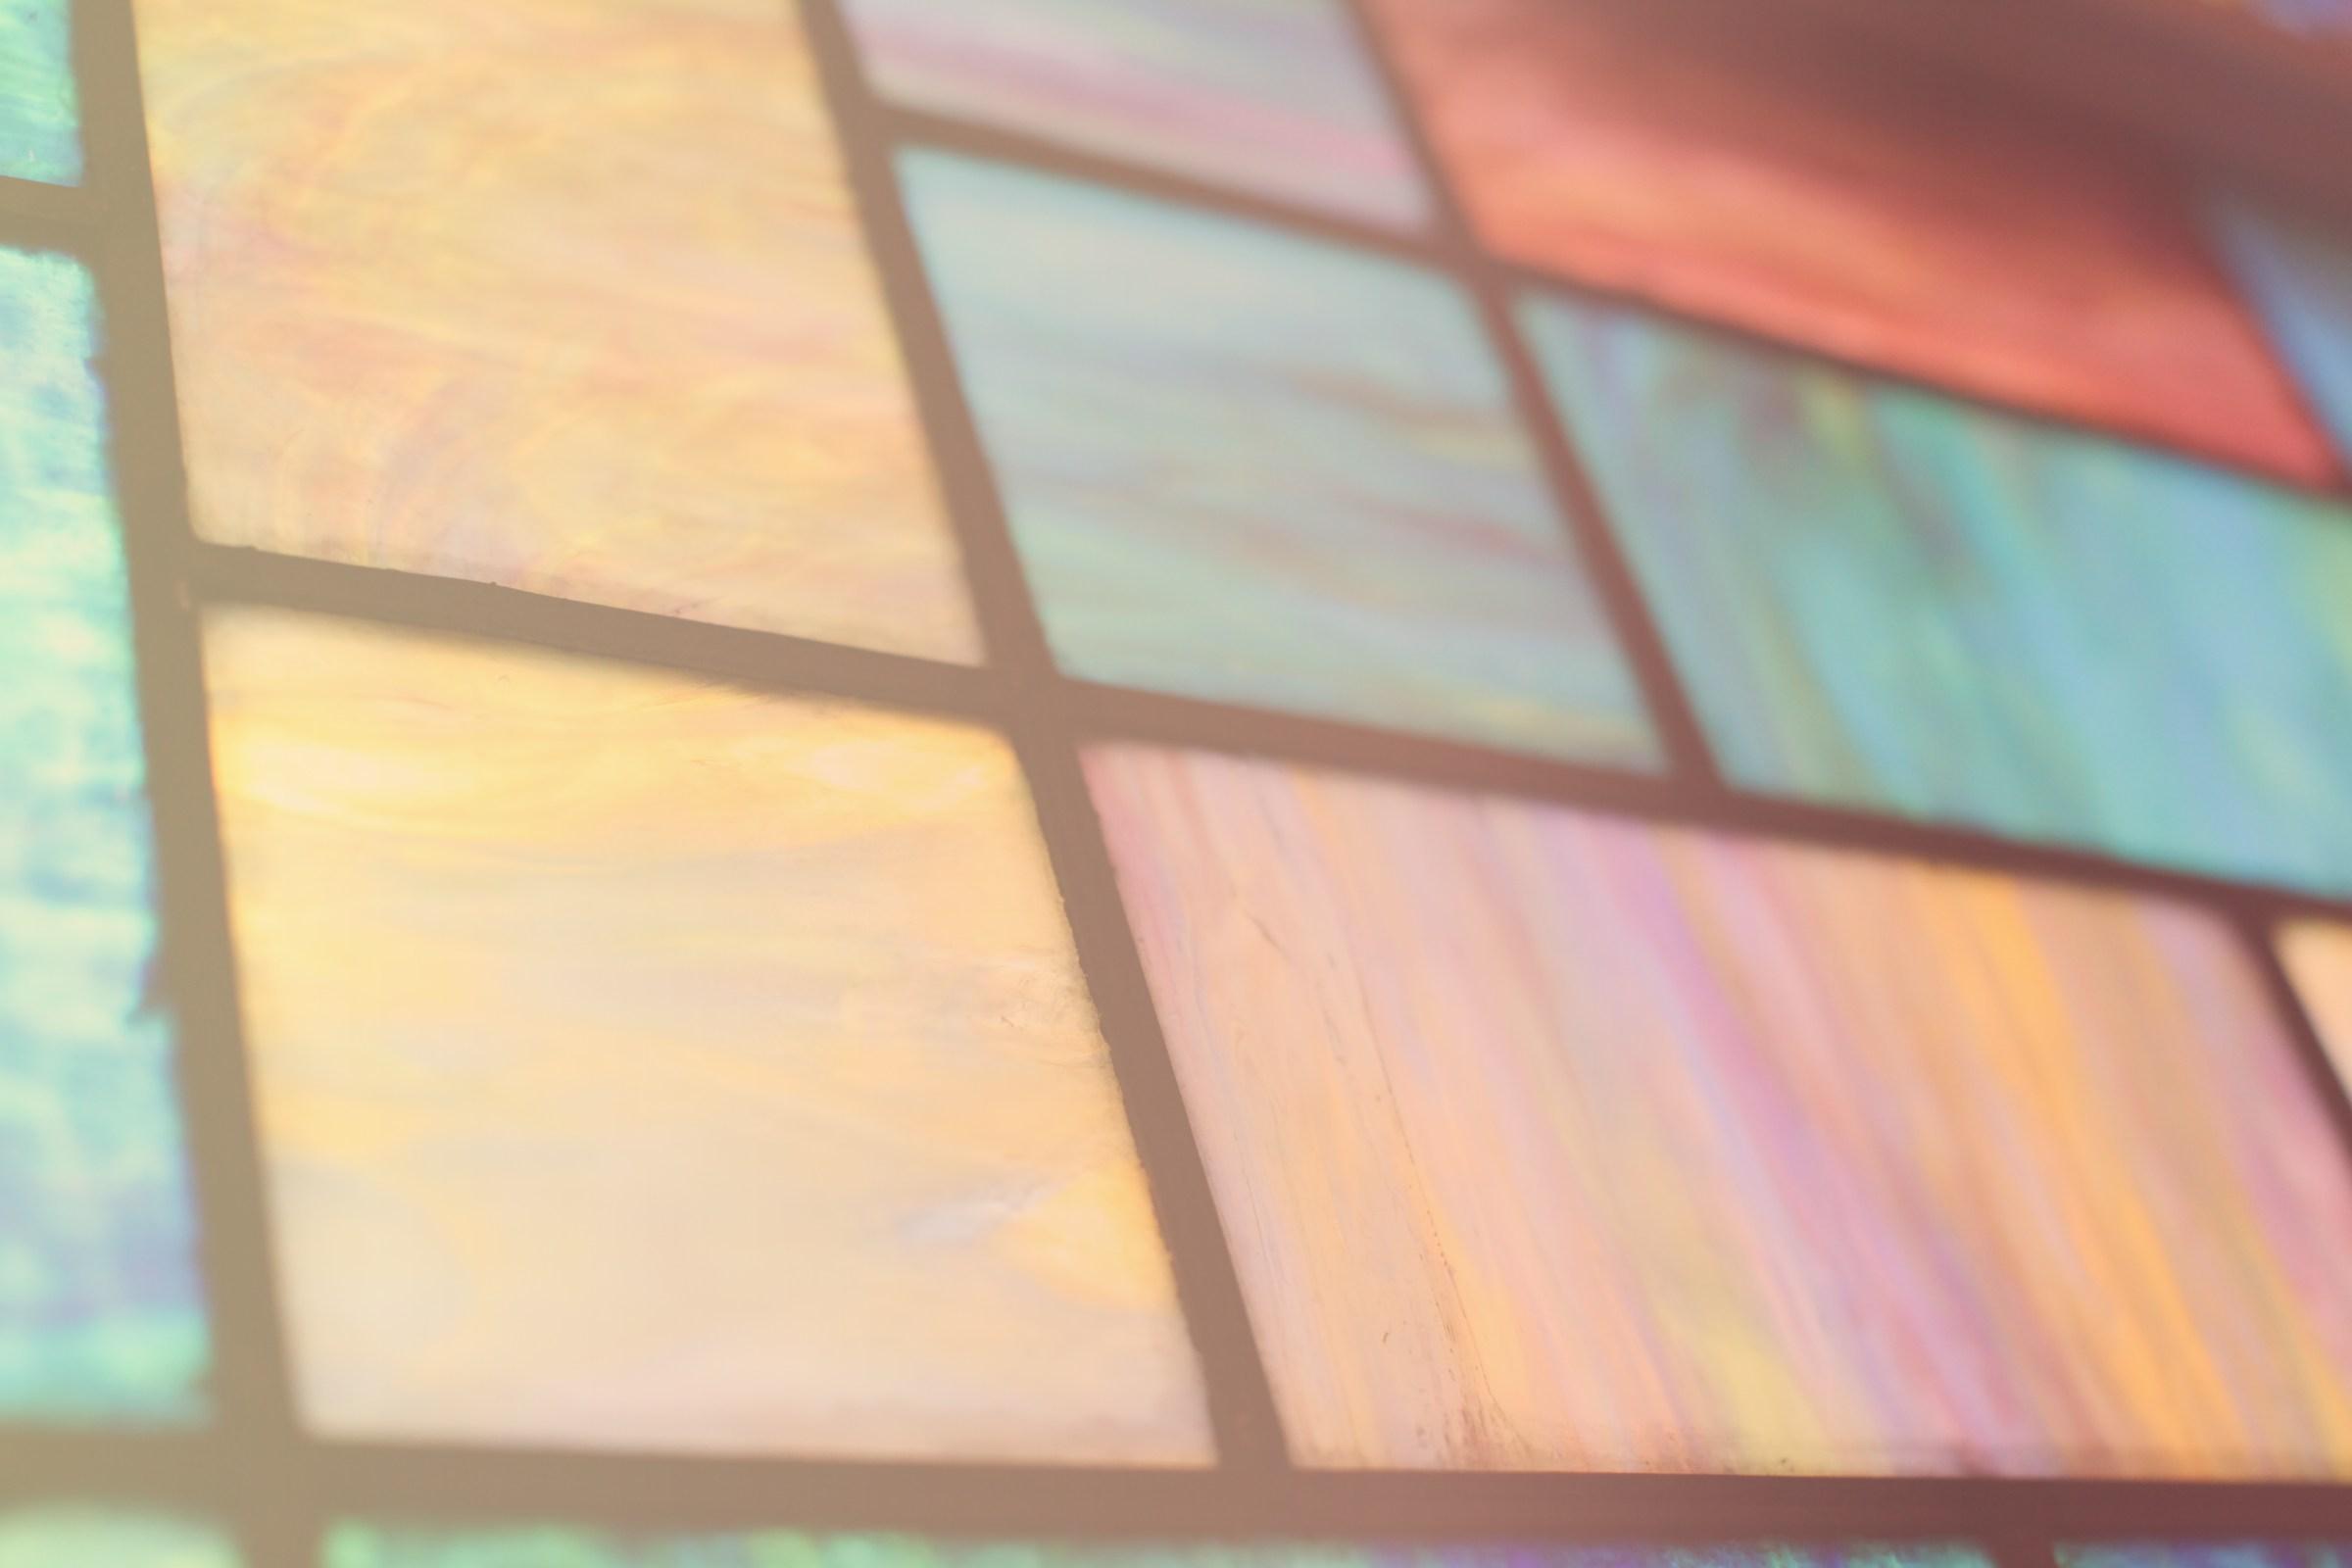 Winter Park Presbyterian Church – Loving & Inclusive church